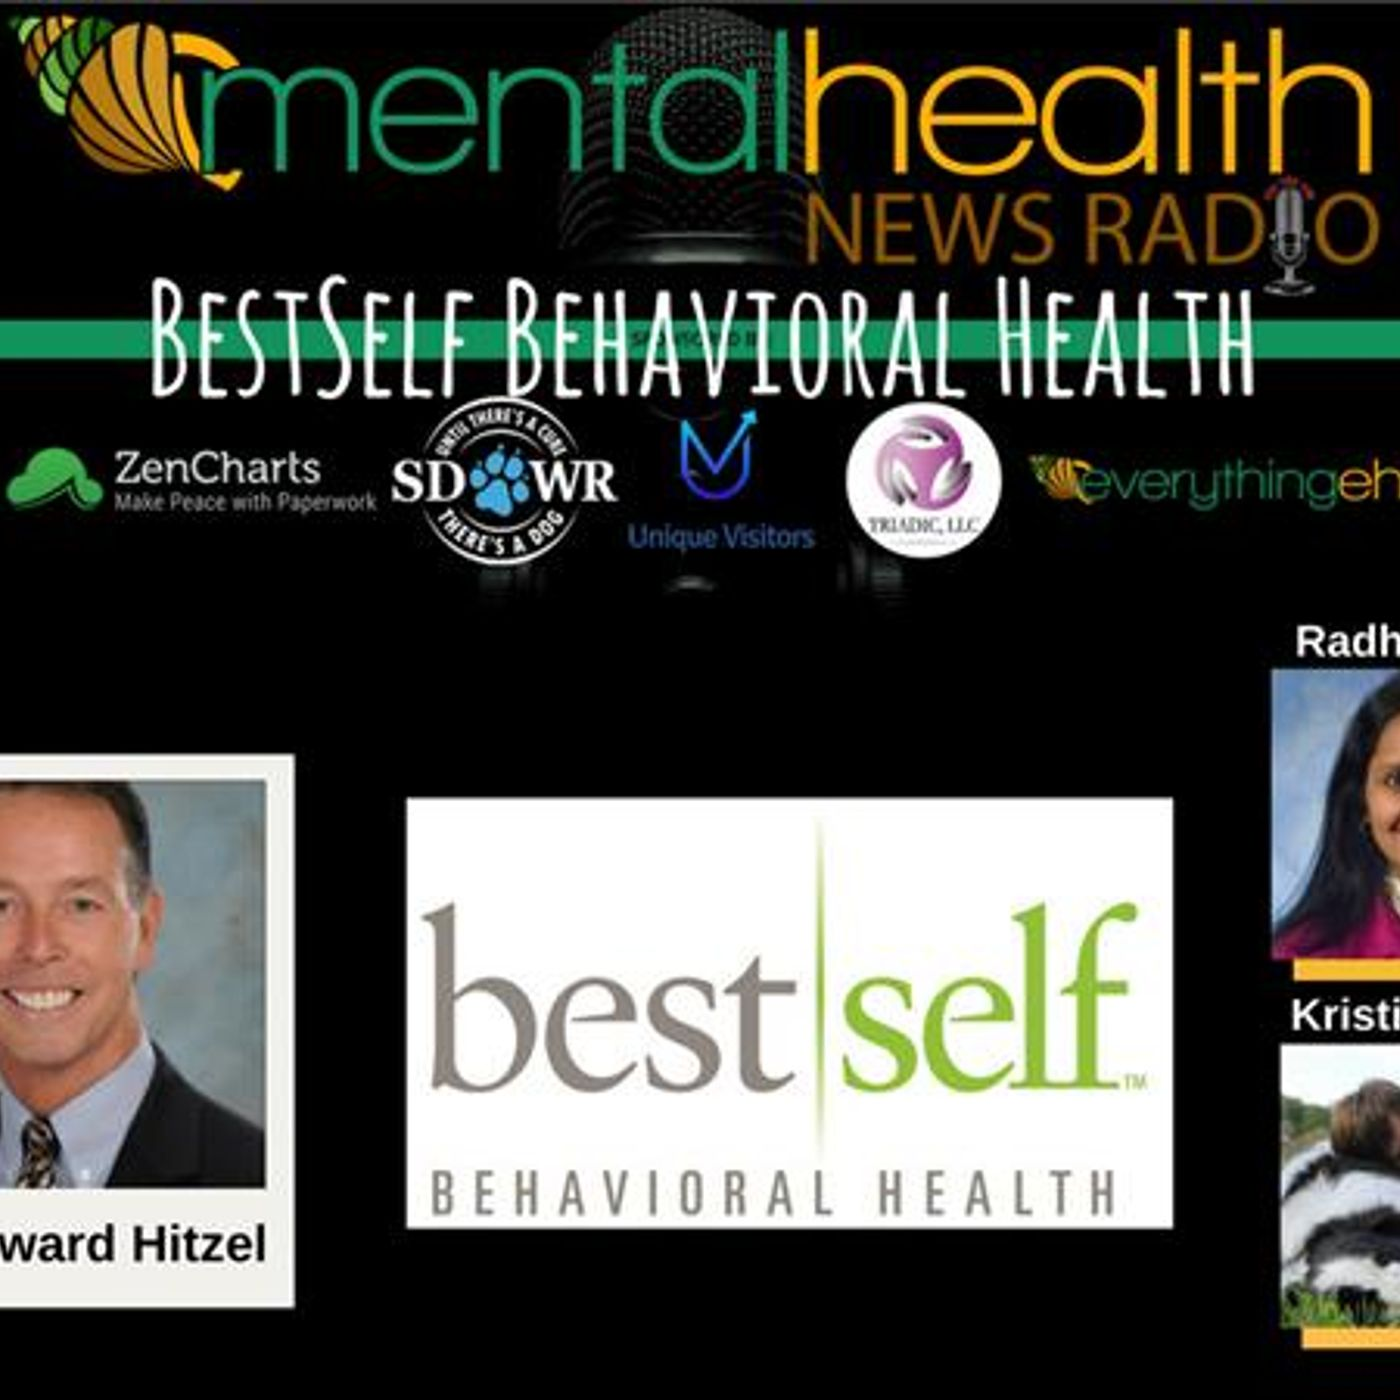 Mental Health News Radio - BestSelf Behavioral Health with Dr. Howard Hitzel